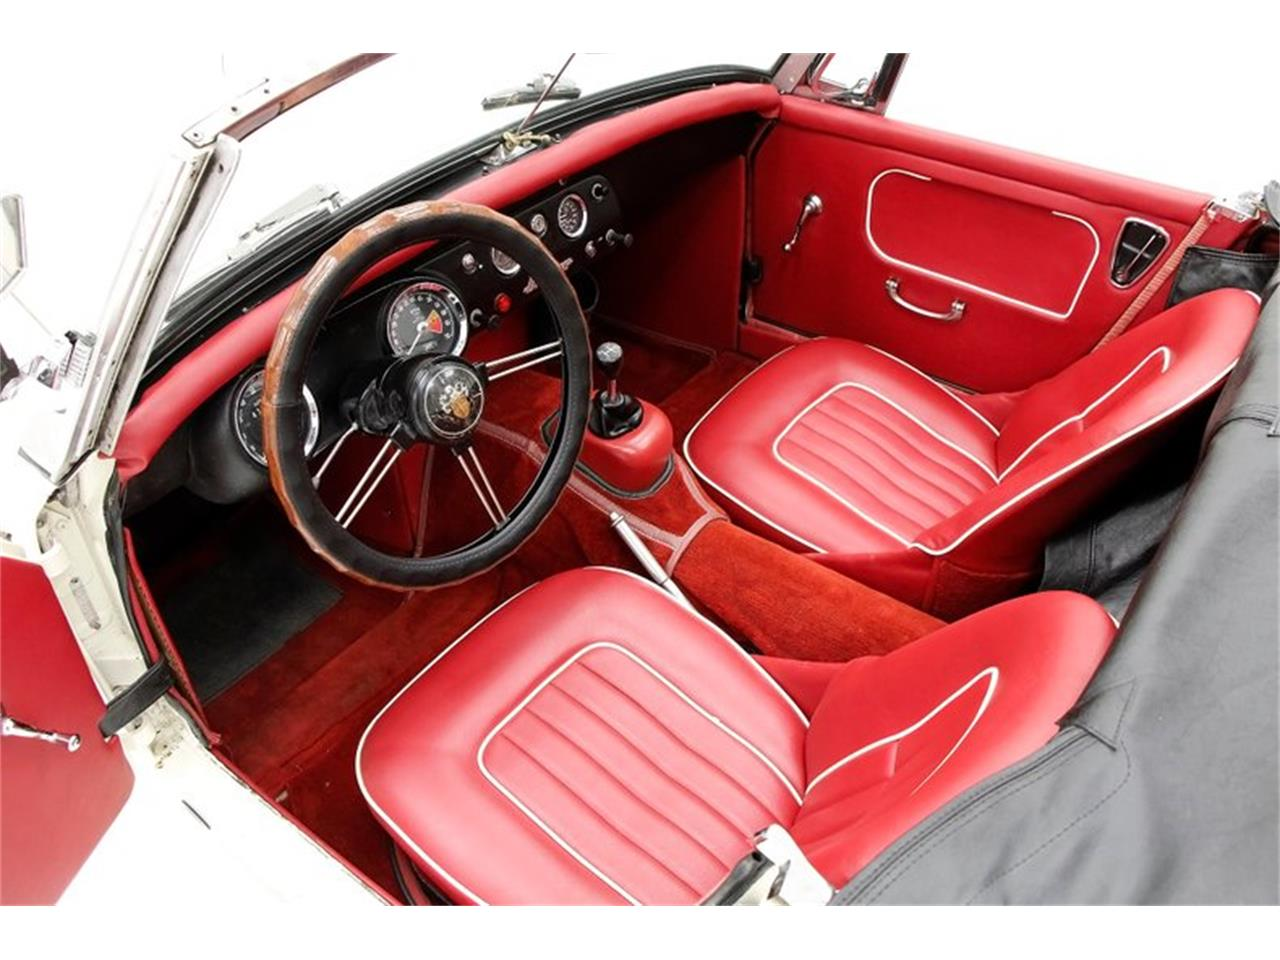 Large Picture of '65 Austin-Healey Sprite located in Pennsylvania - $10,900.00 - QGTT